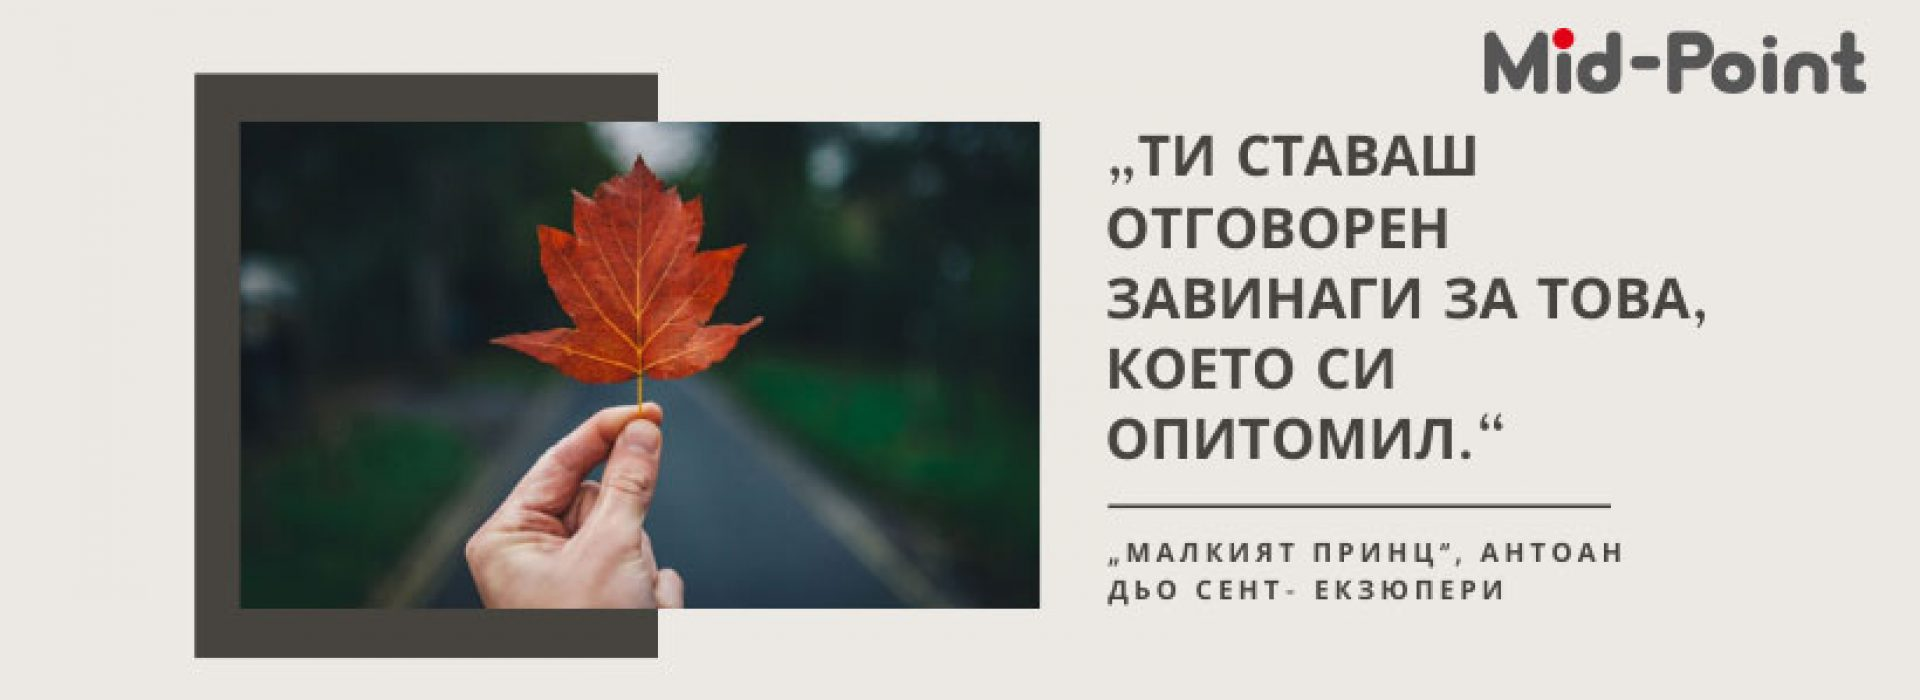 Мид-Пойнт Кариери